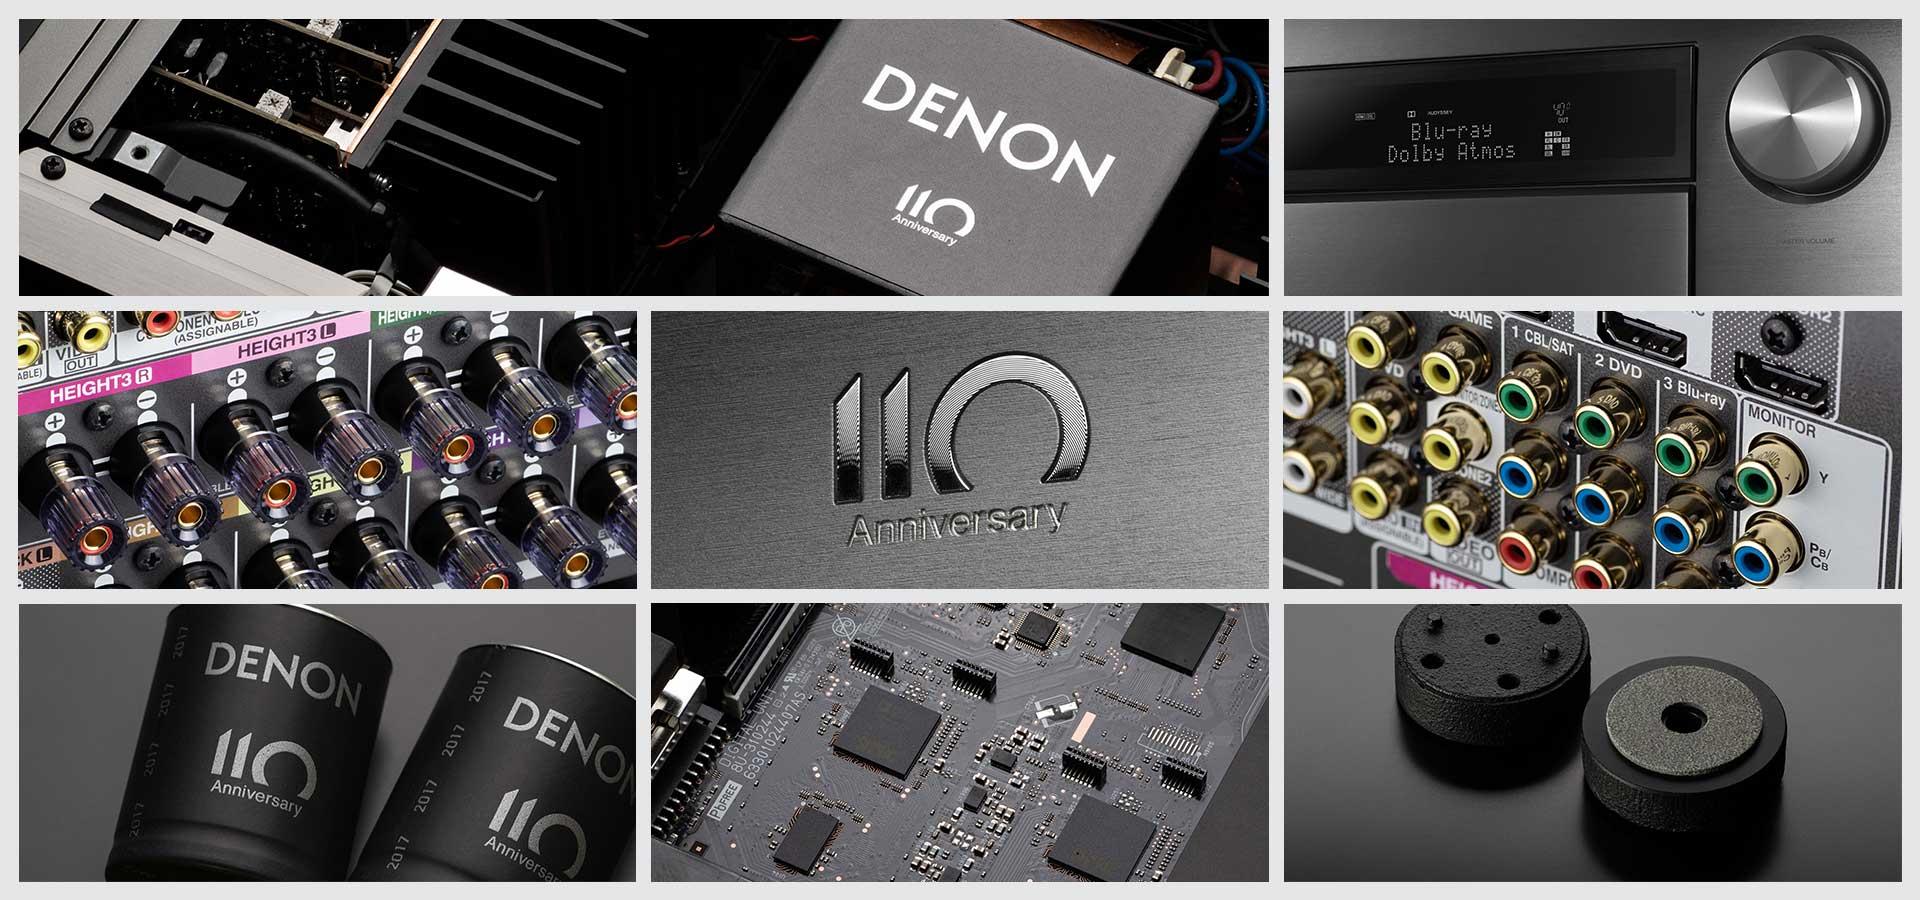 Sevenoaks Sound and Vision - Denon AVC A110 AV Amplifier